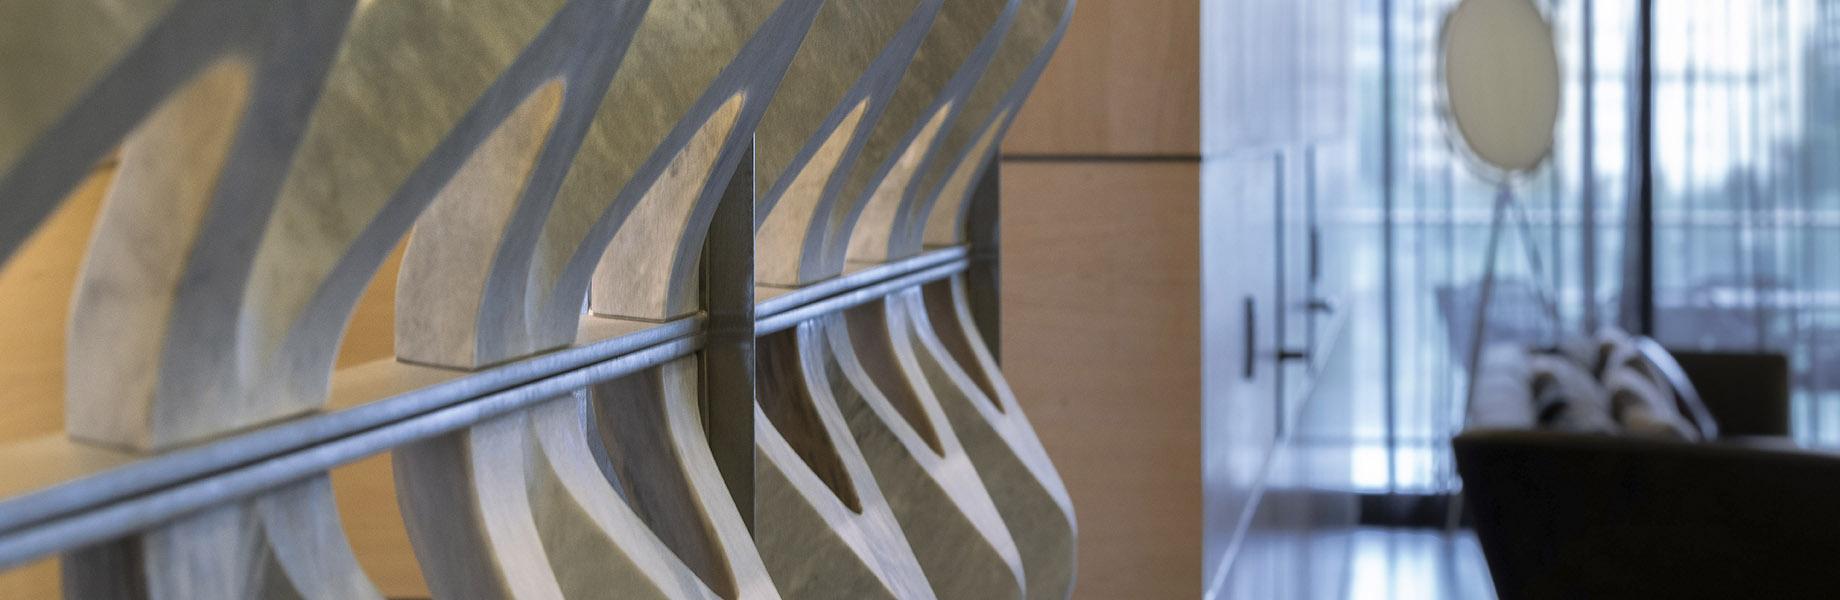 LithosDesign_retina_marble_divider_for_stone_interiors